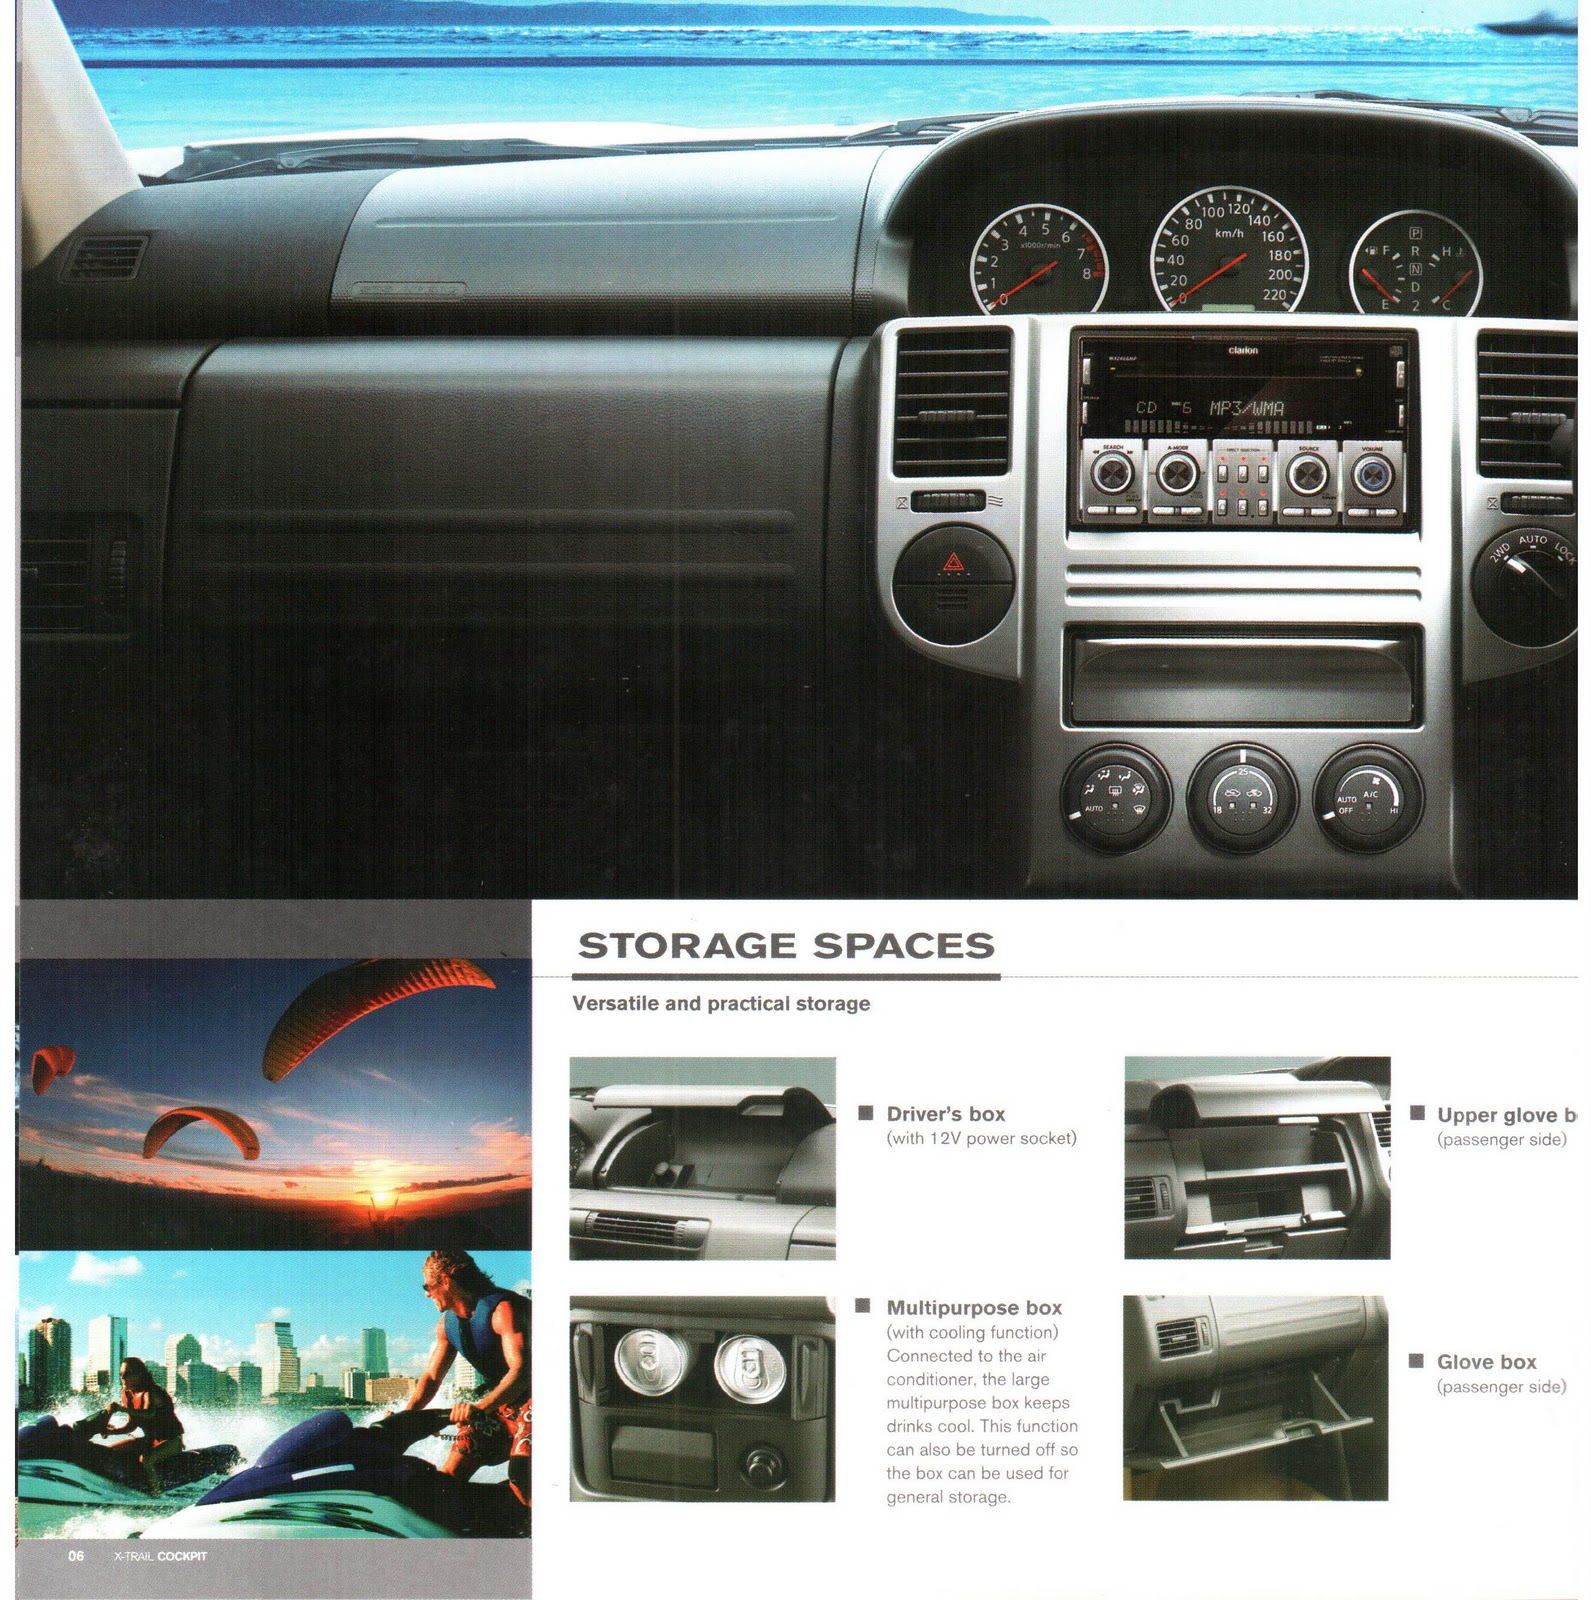 Enjin autos post for Ford motor credit company address atlanta ga